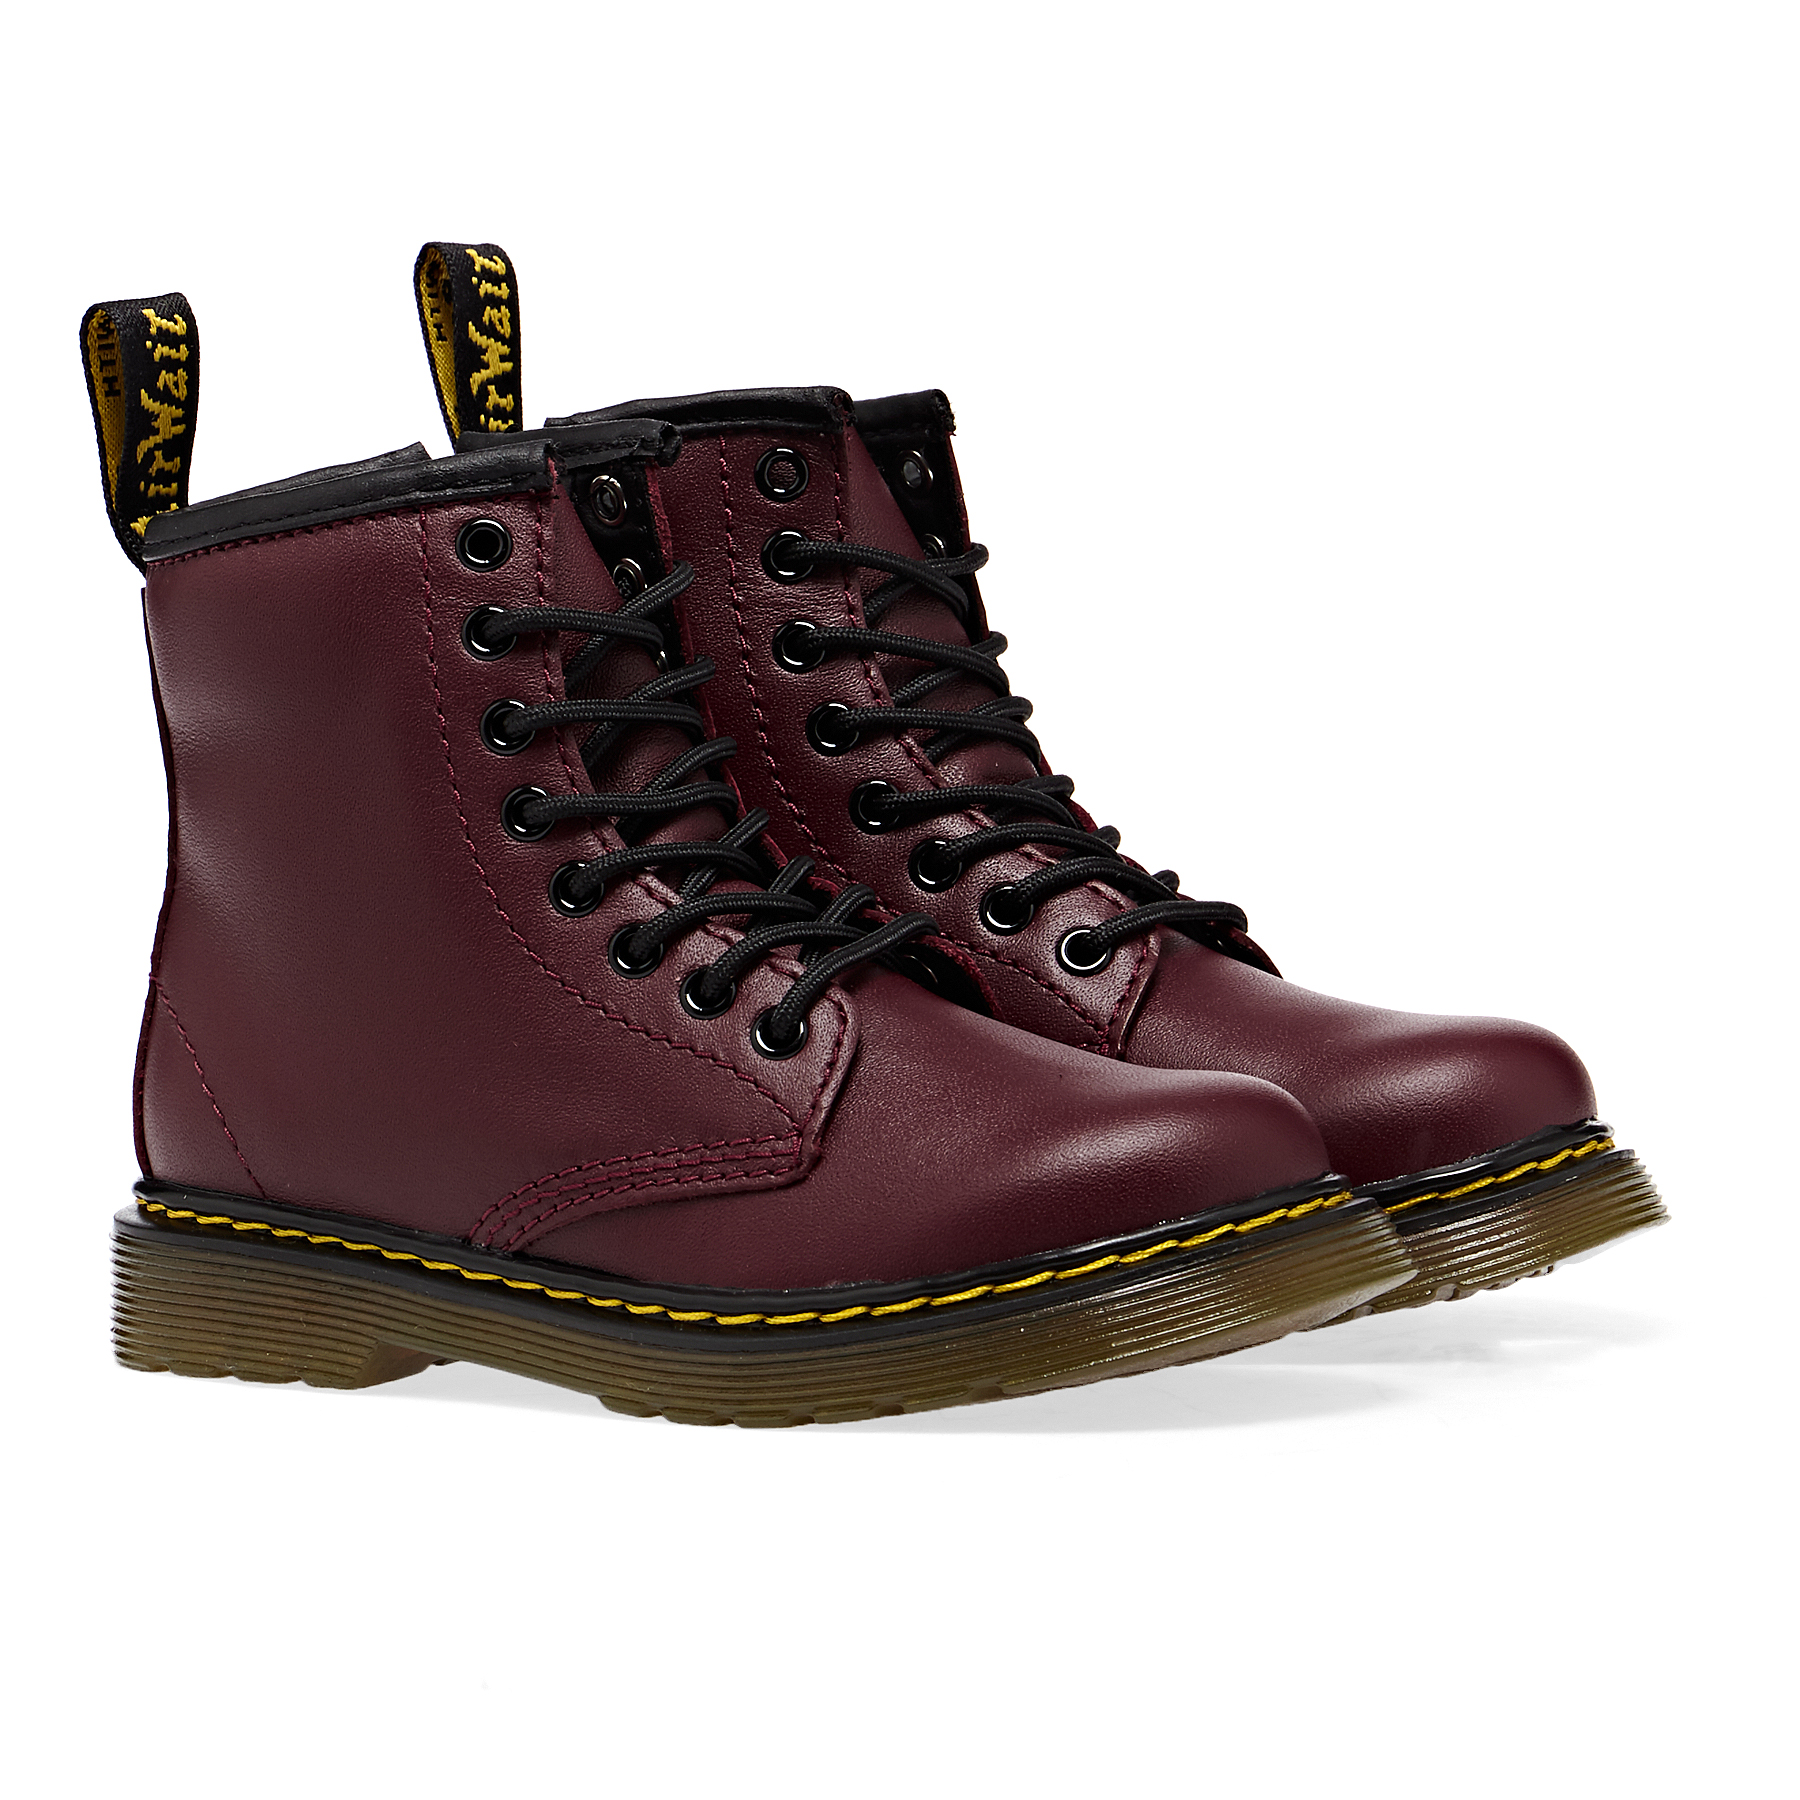 doc martins kids boots